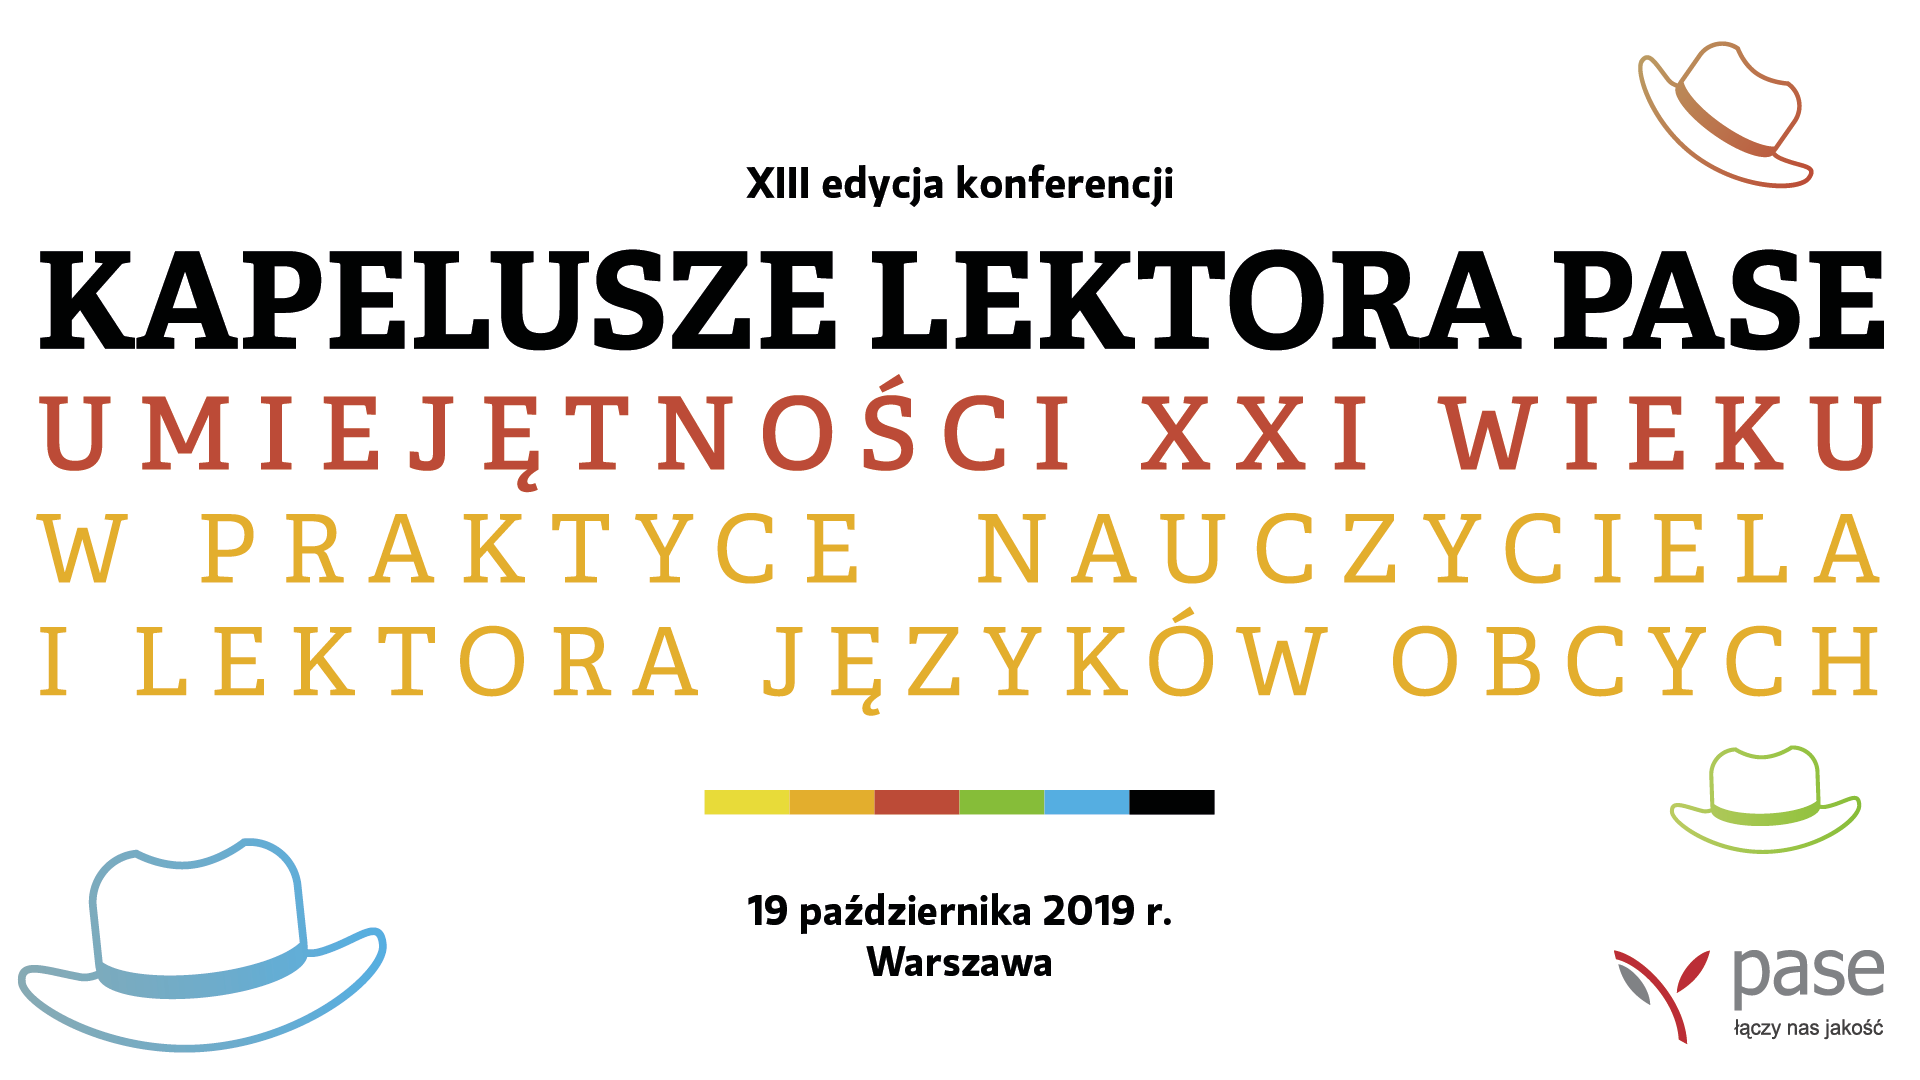 Kapelusze Lektora PASE 2019